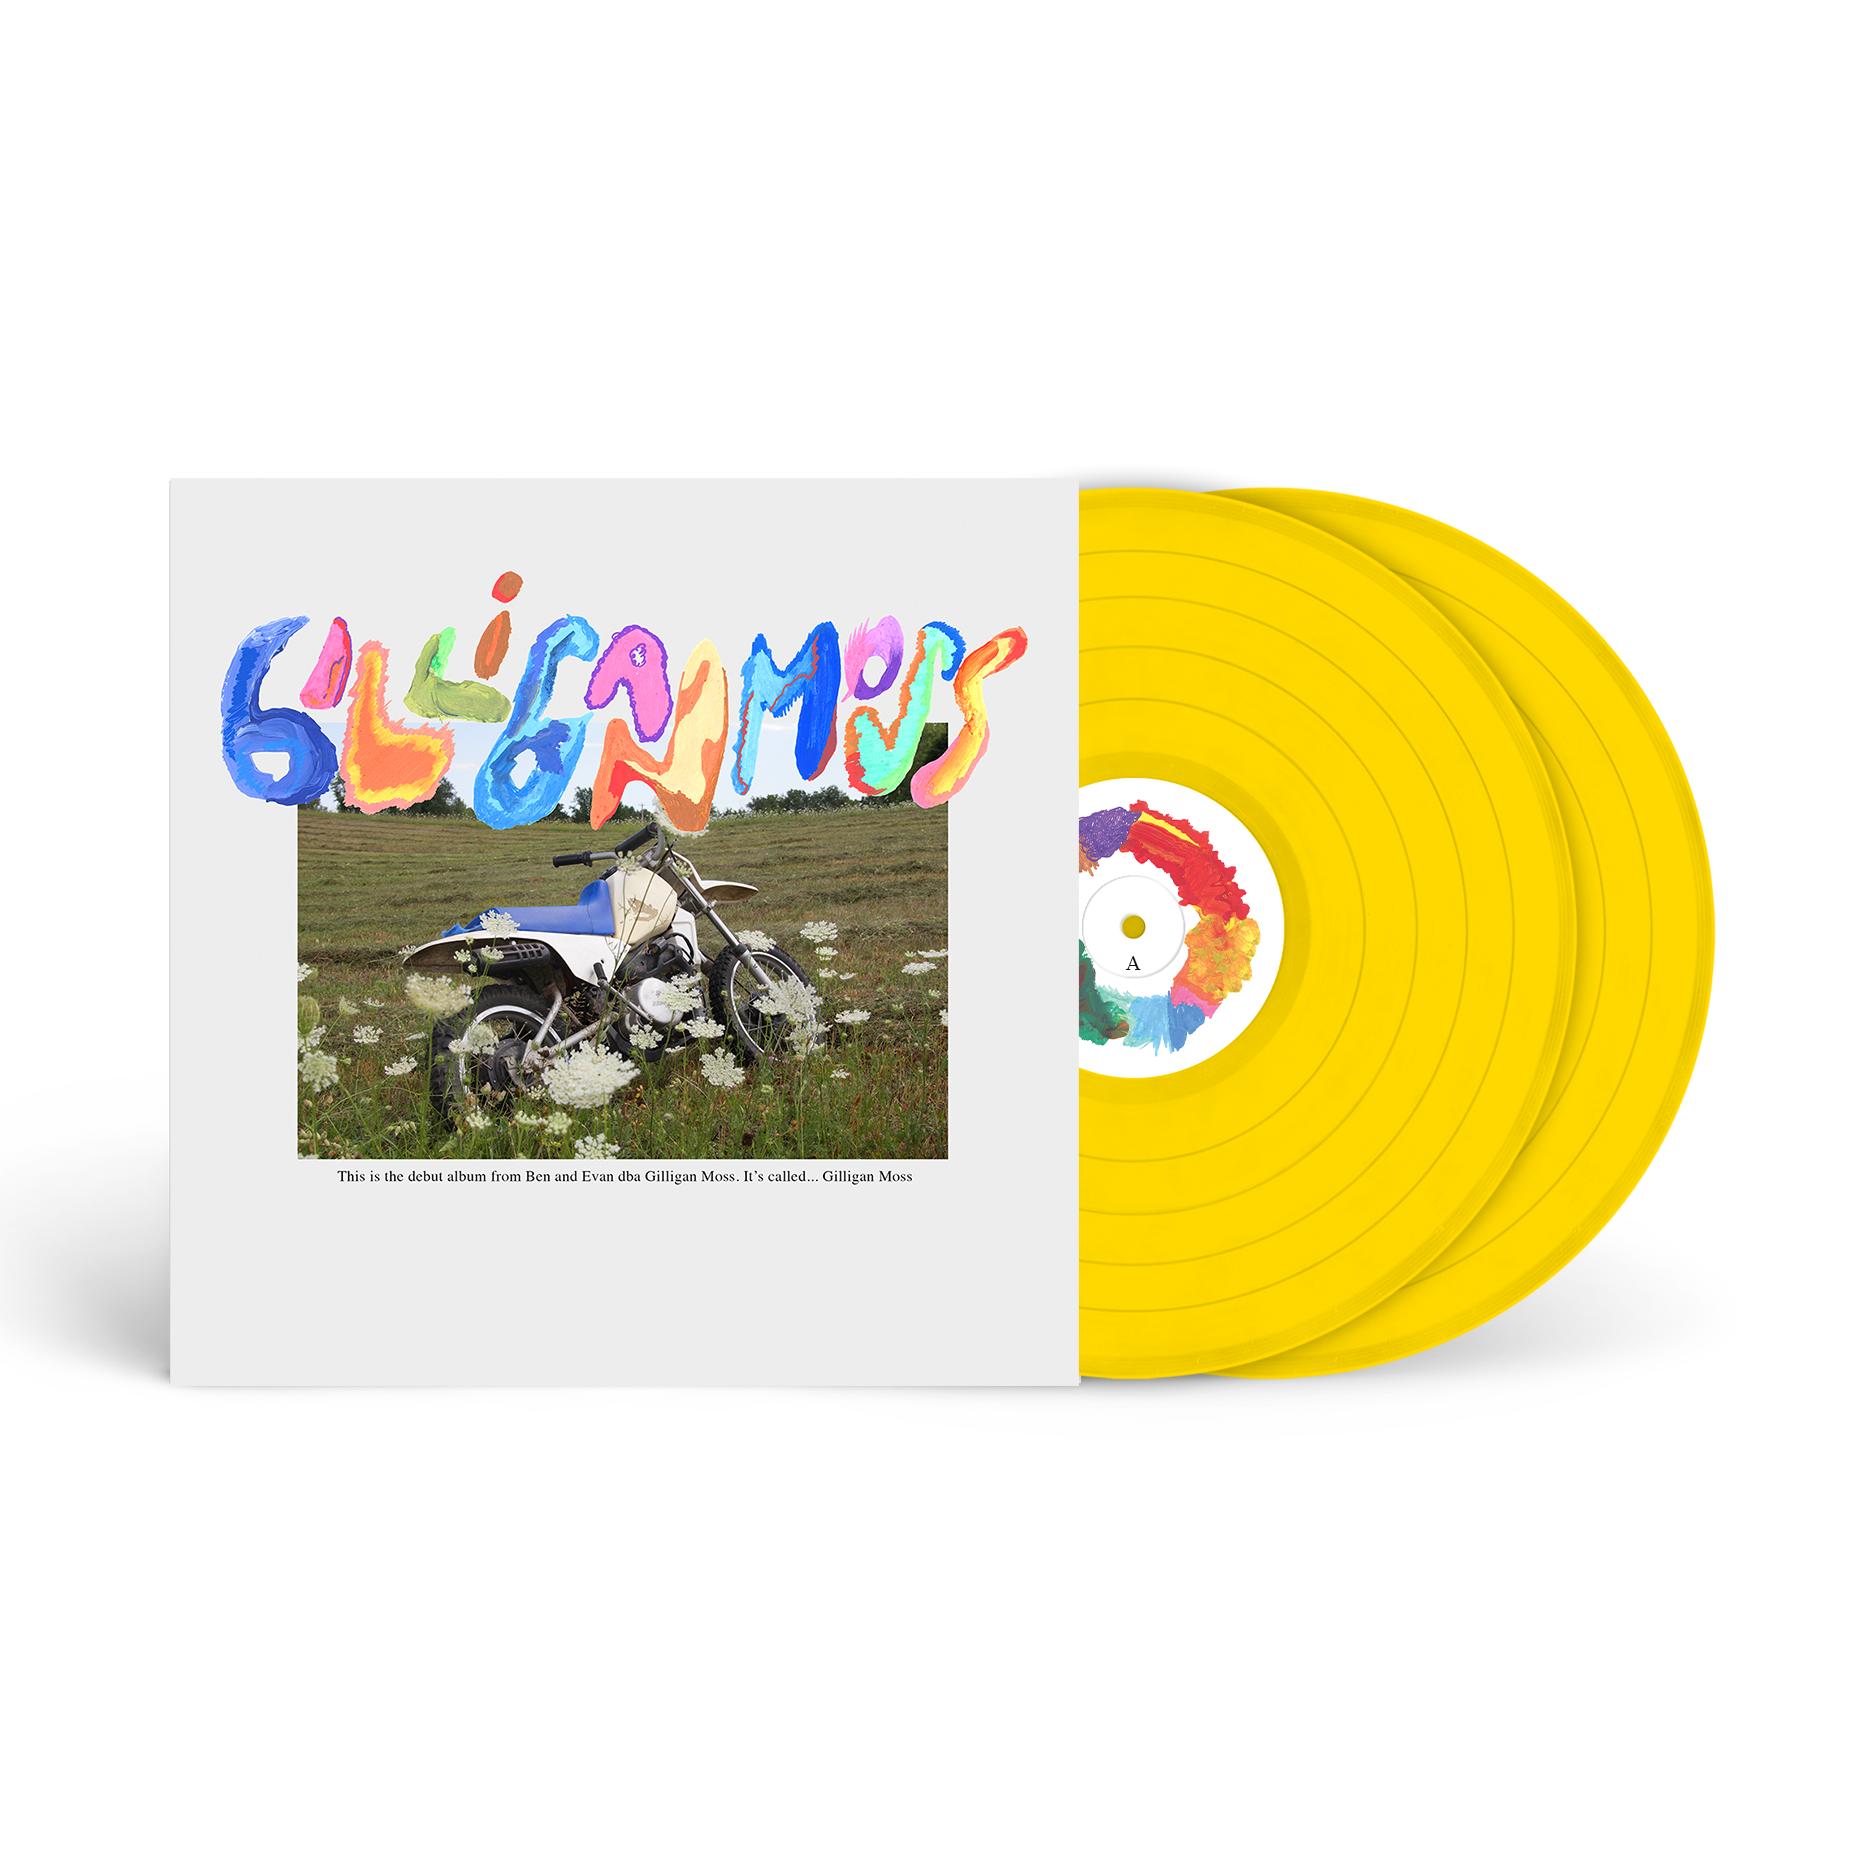 Gilligan Moss - The Debut Album